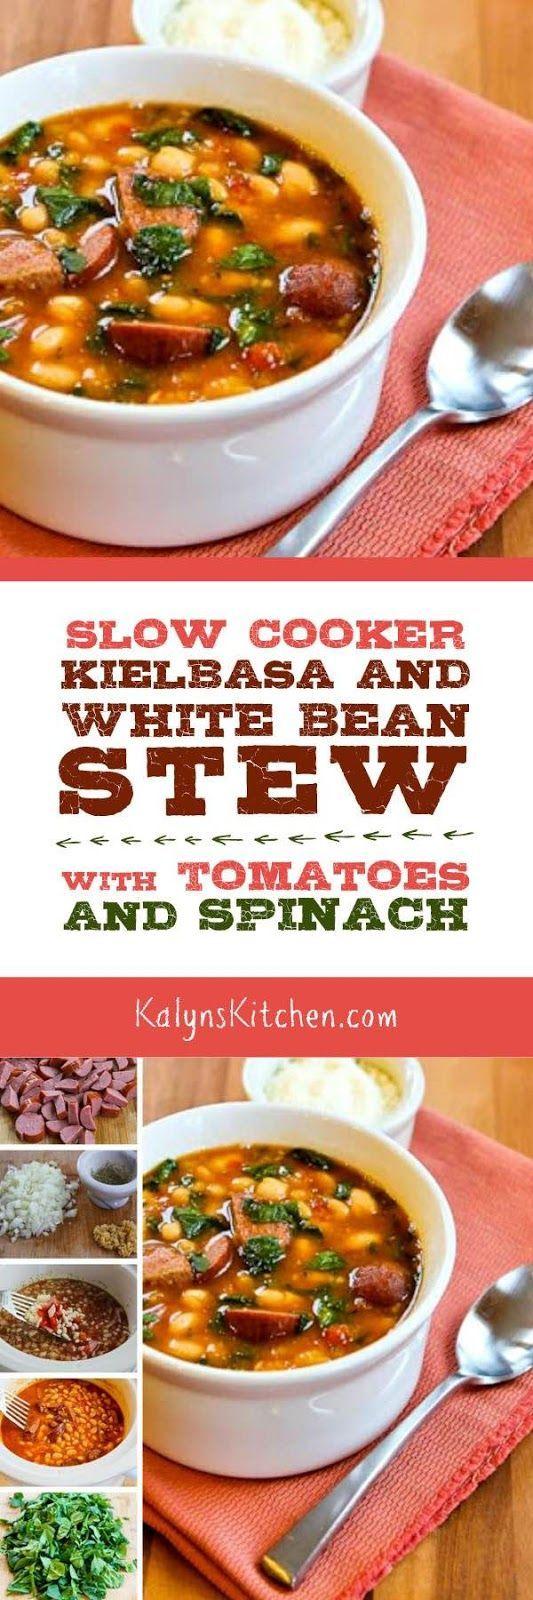 376 best Crockpot Recipes images on Pinterest | Crockpot ...